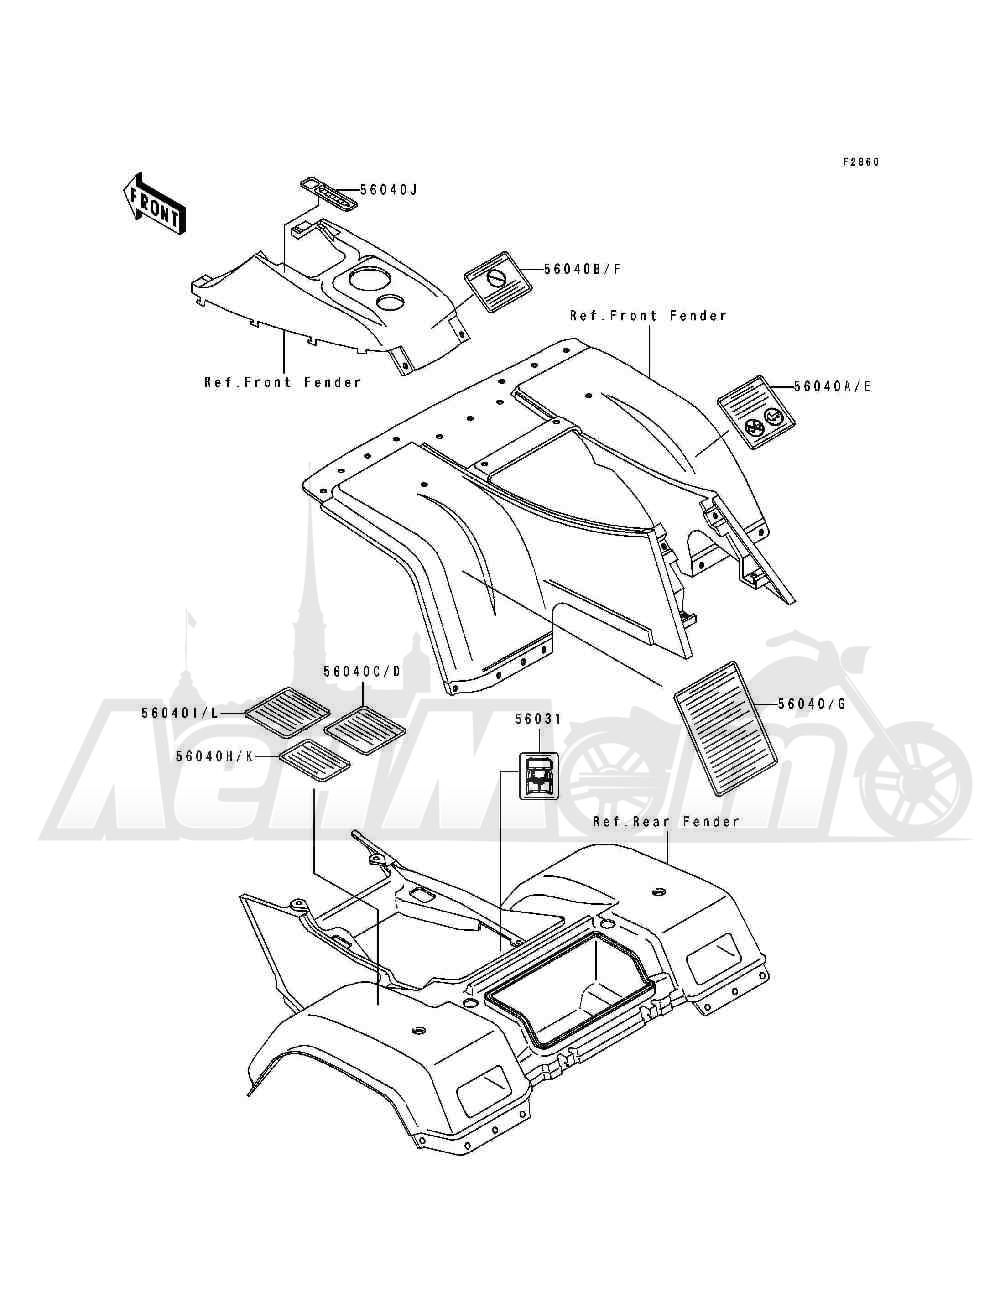 Запчасти для Квадроцикла Kawasaki 1994 BAYOU 400 4X4 (KLF400-B2) Раздел: LABELS | этикетки, метки